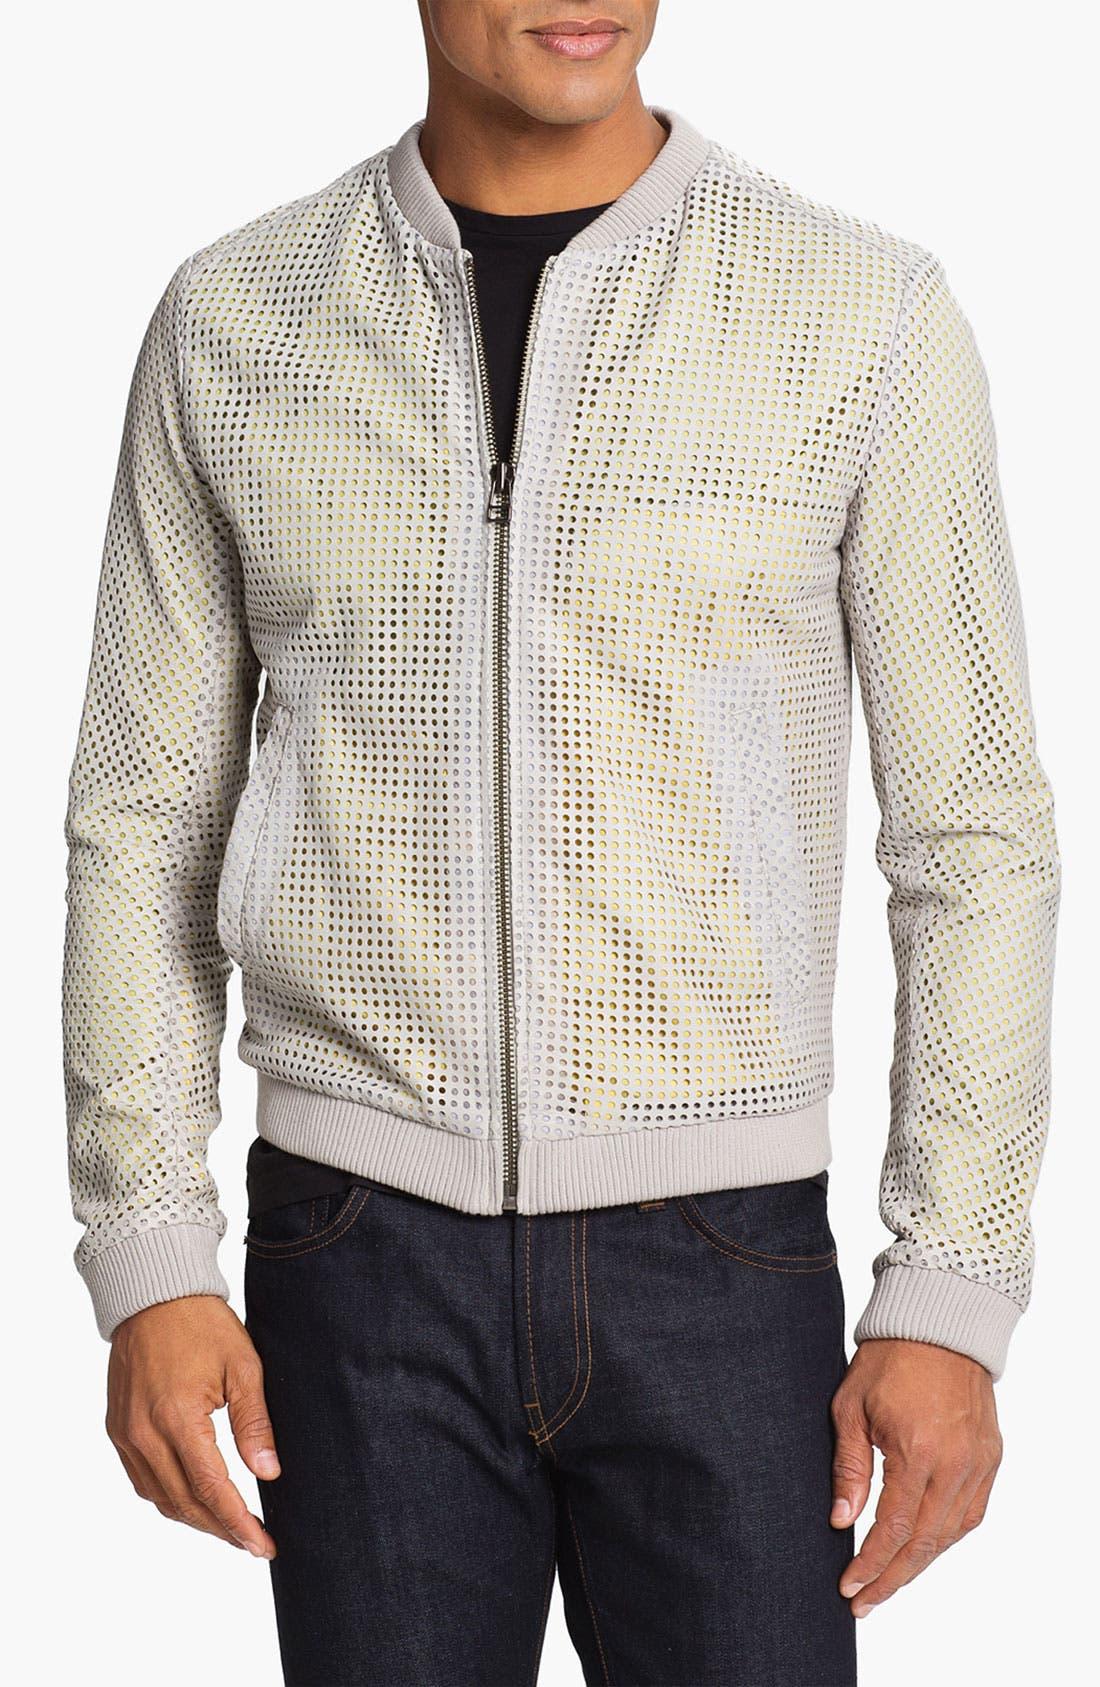 Alternate Image 1 Selected - adidas SLVR Leather Jacket